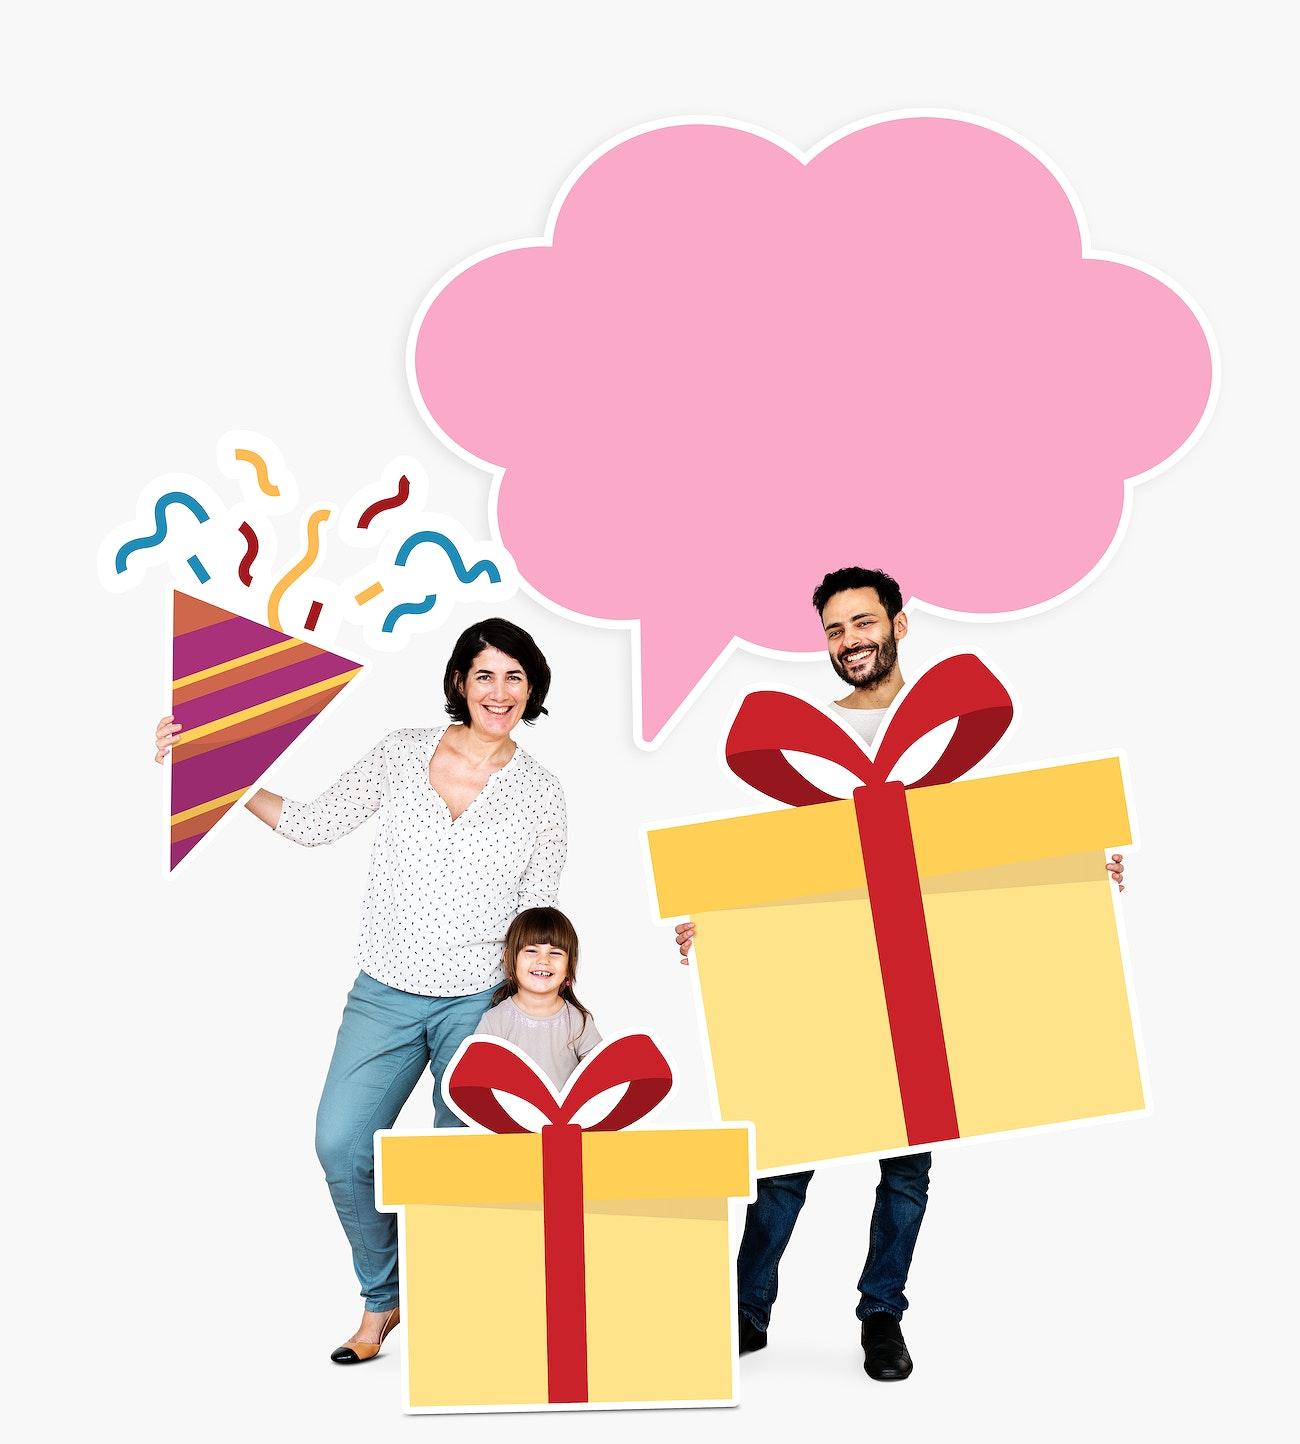 Happy Family Holding Gift Box Icons Royalty Free Illustration 490287